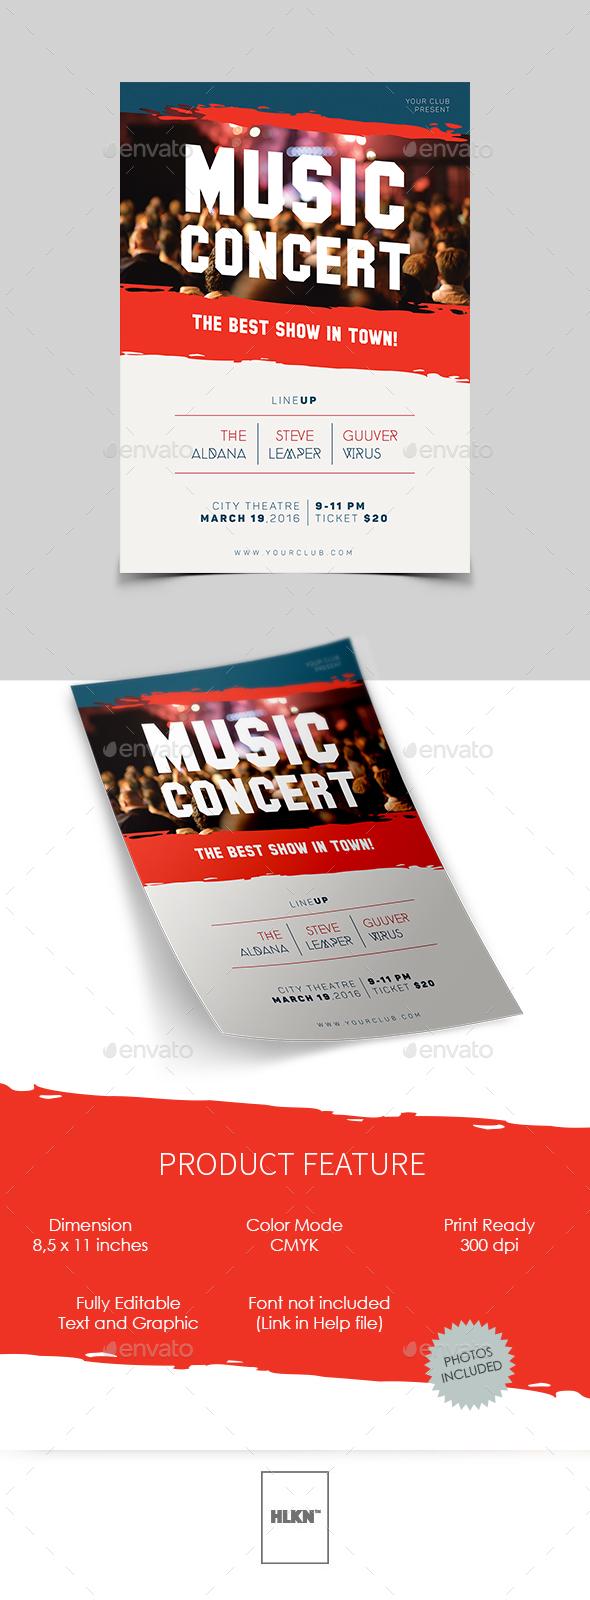 Music Concert Flyer - Concerts Events